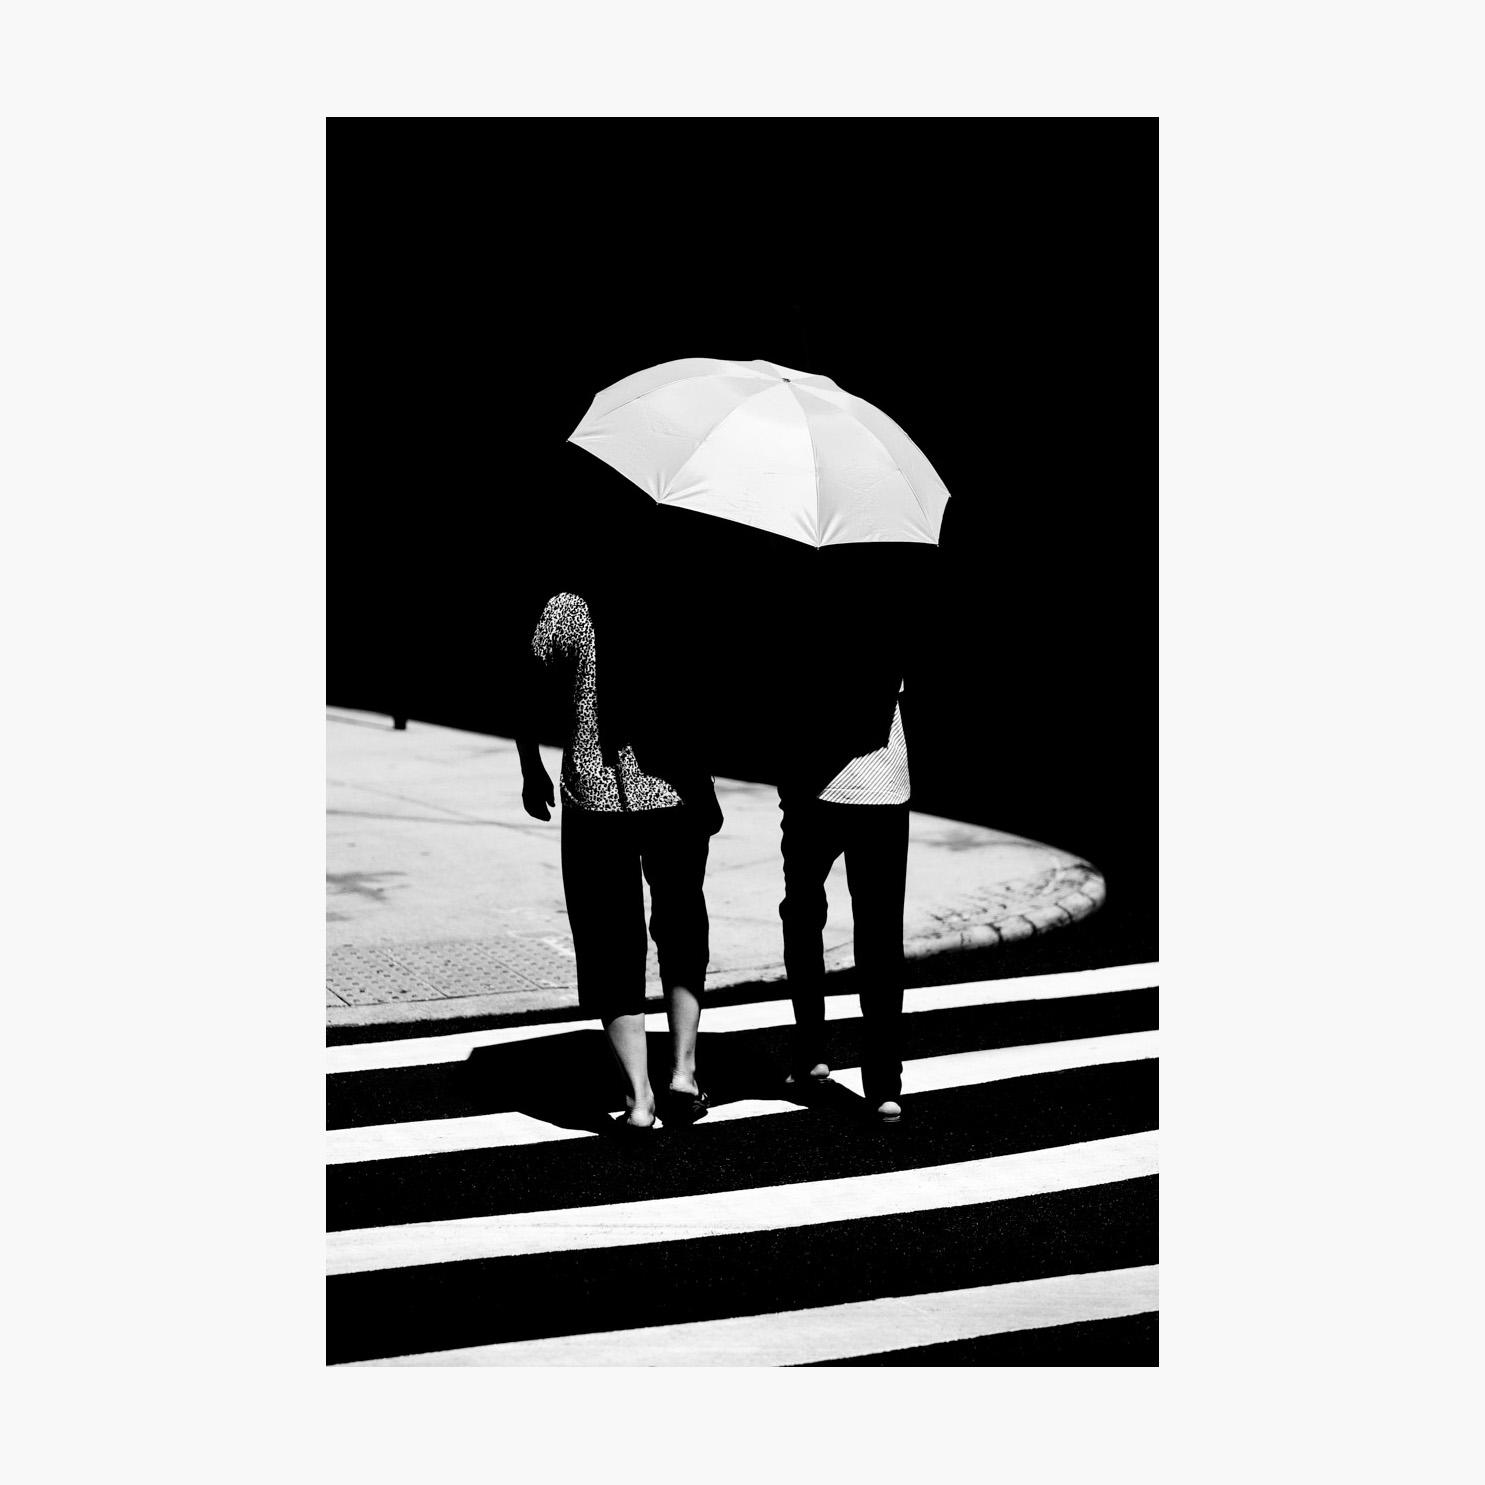 ©-2018-Harry-W-Edmonds-London-Photographer-Missing-the-Shot-PN07.jpg